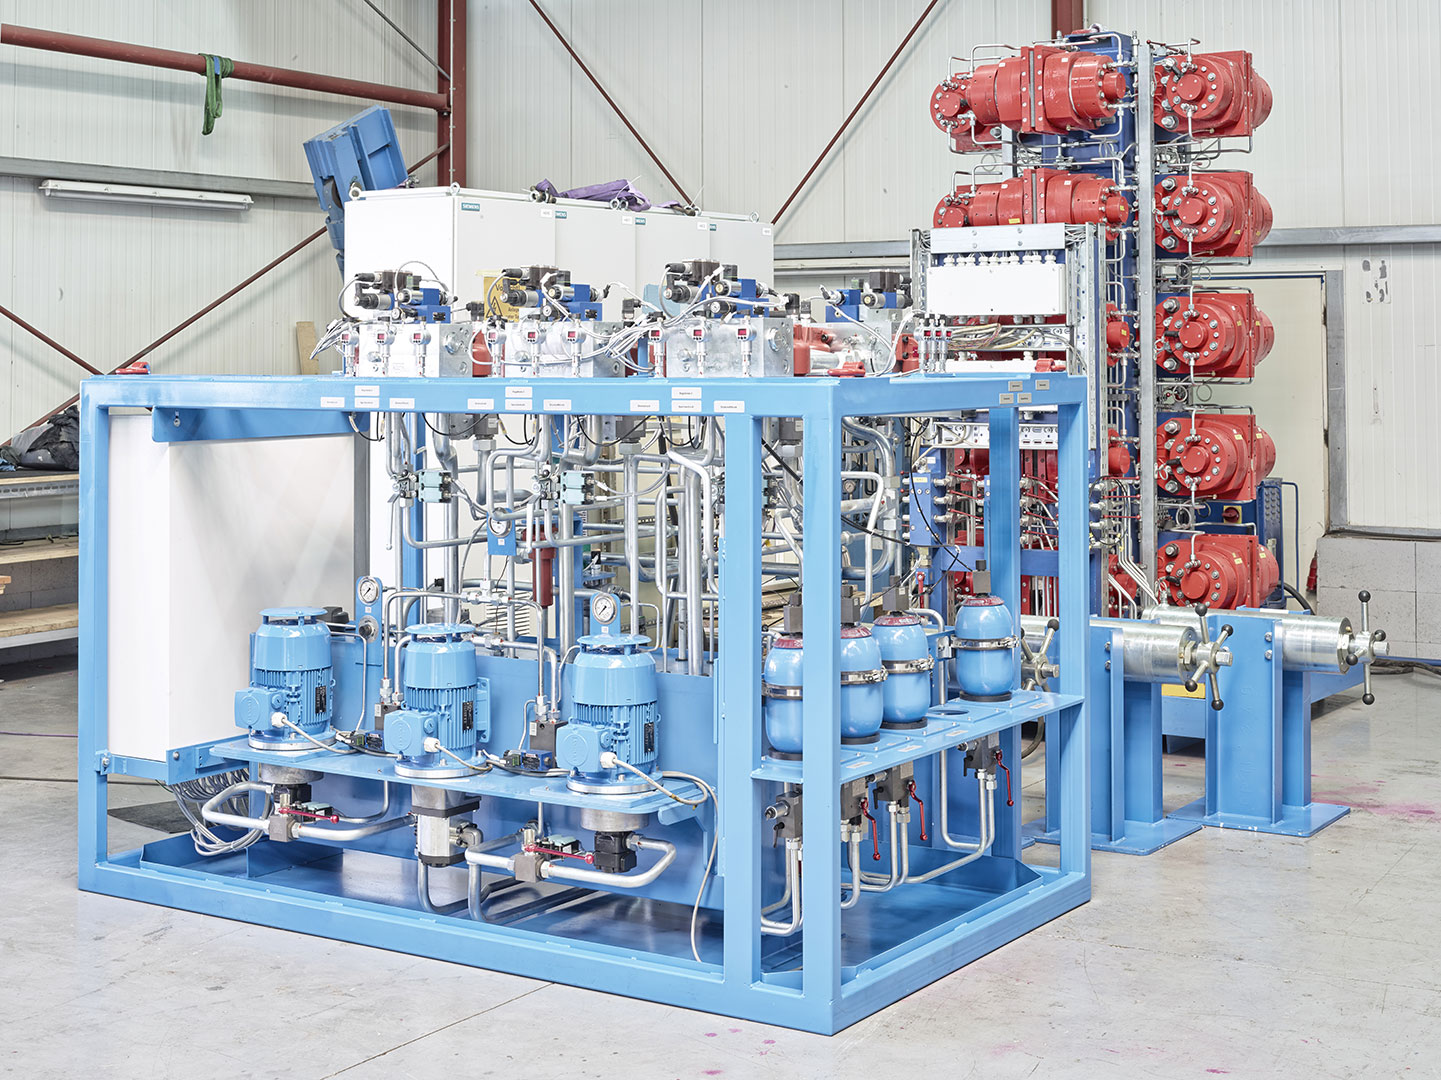 Brake Systems Units Hydraulics Olko Maschinentechnik Gmbh Power Control Unit Hydraulic Description Previous Next